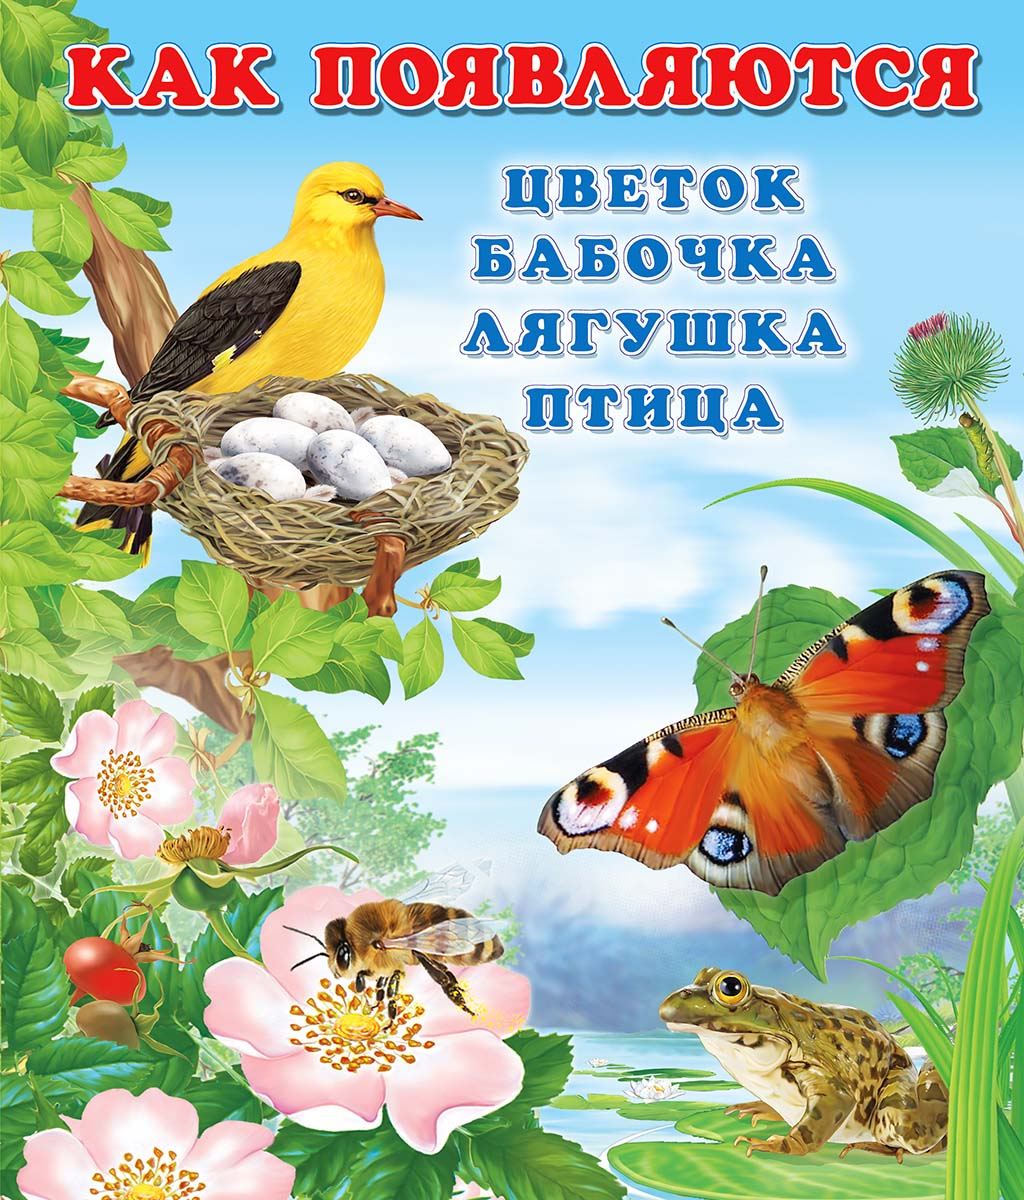 И. Гурина Как появляются цветок, бабочка, лягушка, птица